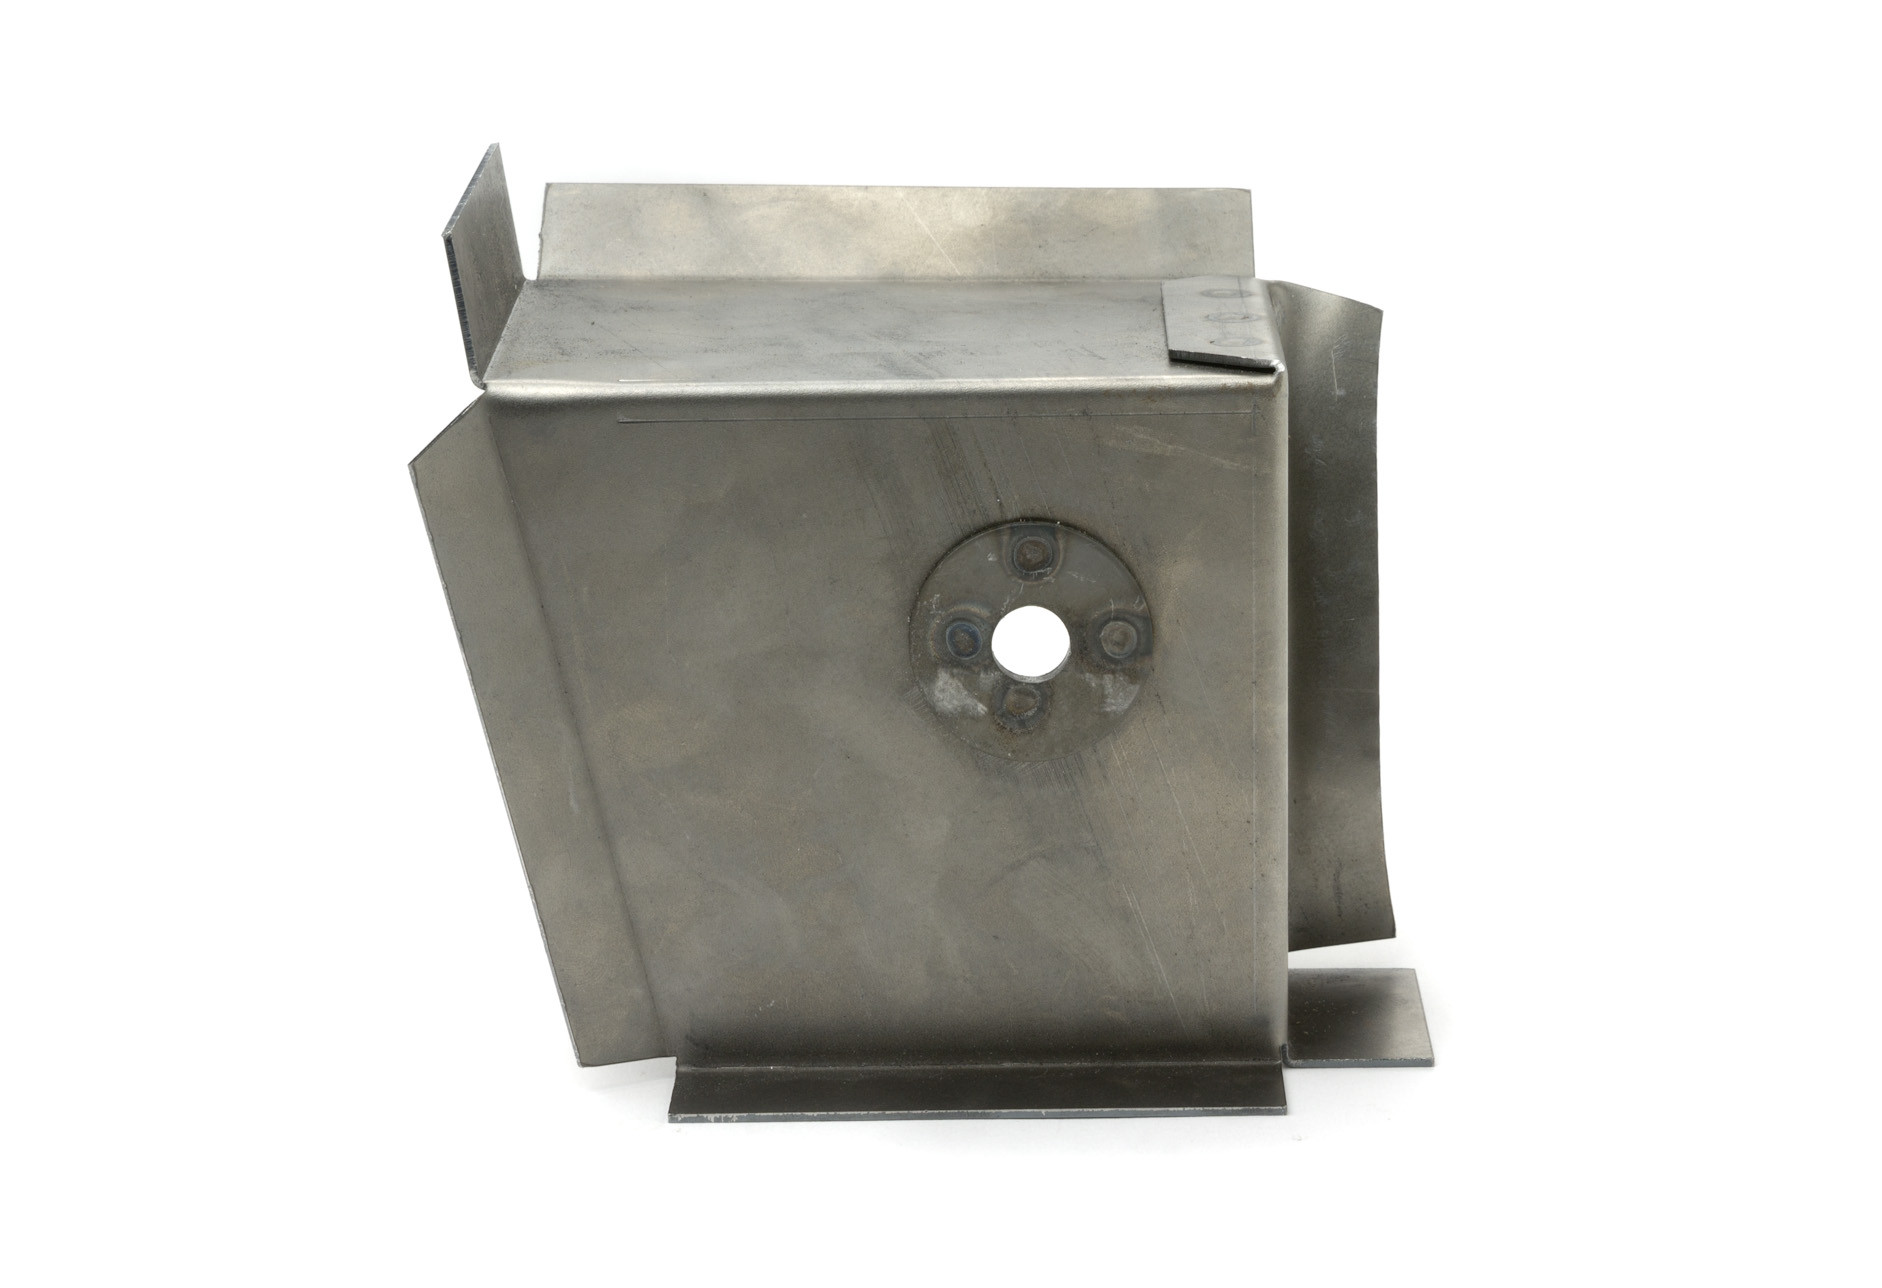 Radius arm box